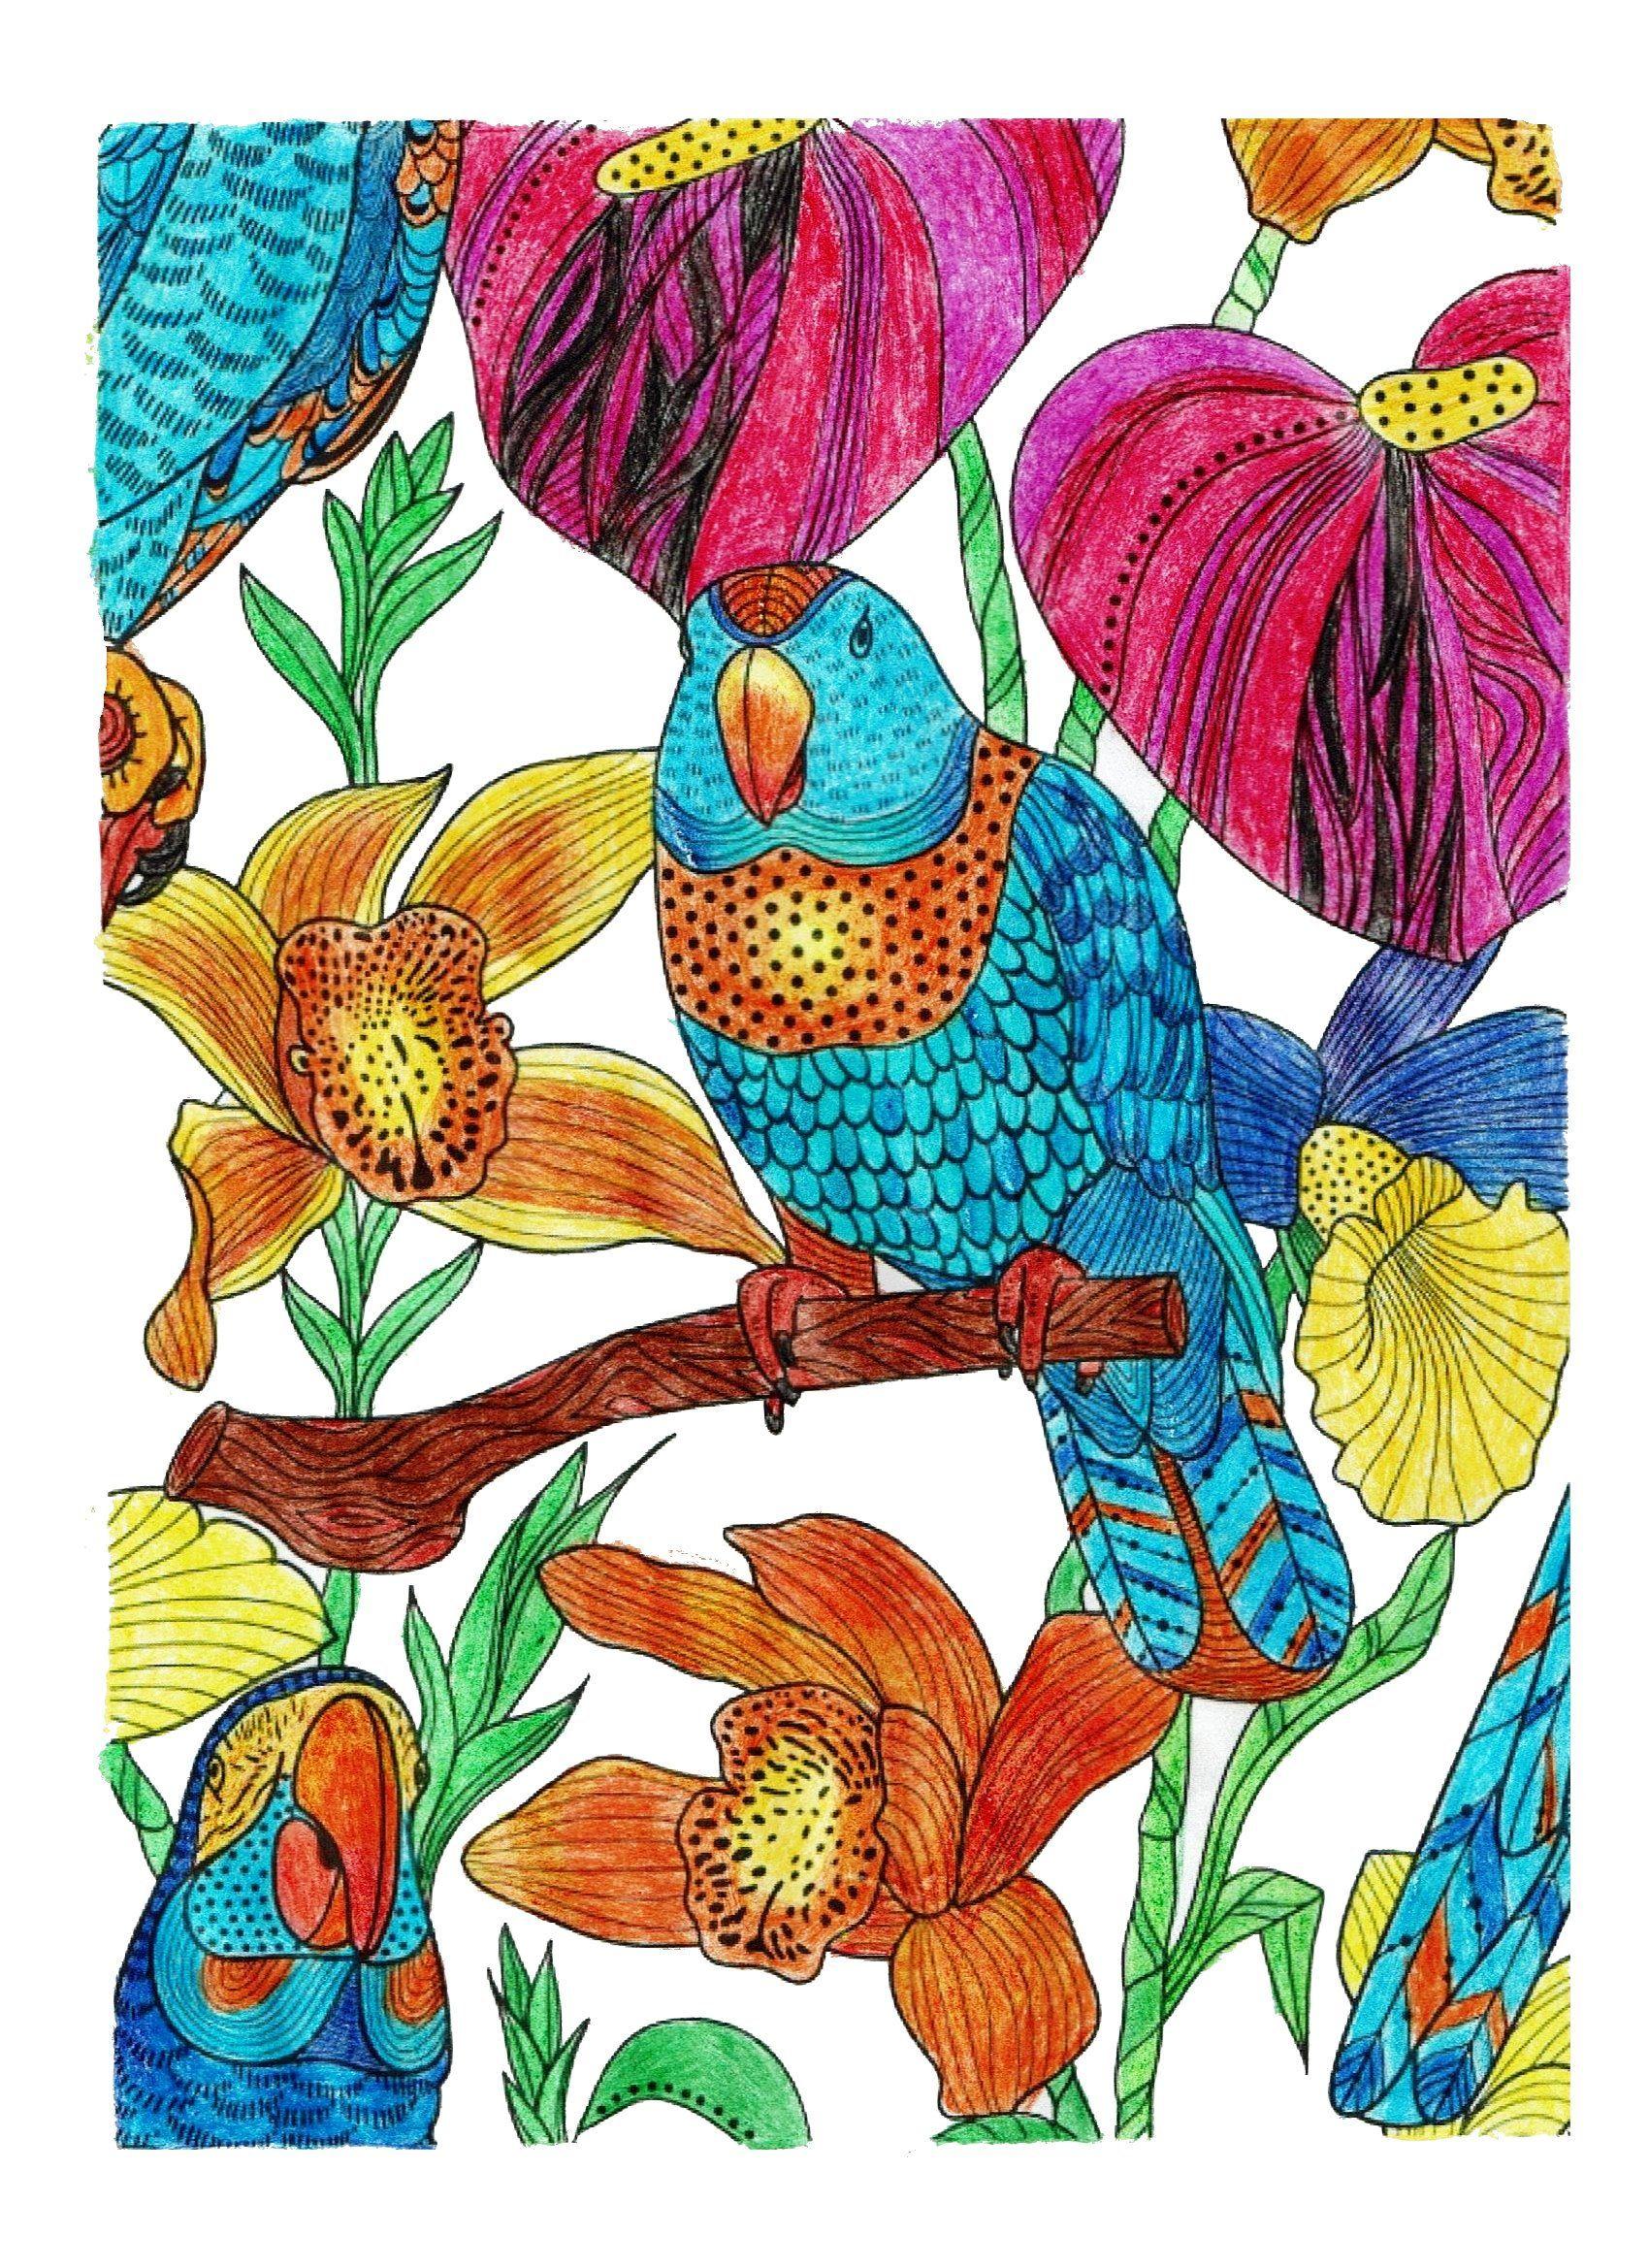 #coloringbook #coloringforadults #color #adultcoloring #colouring #coloring #milliemarotta #tropicalworld #beautifulcoloring